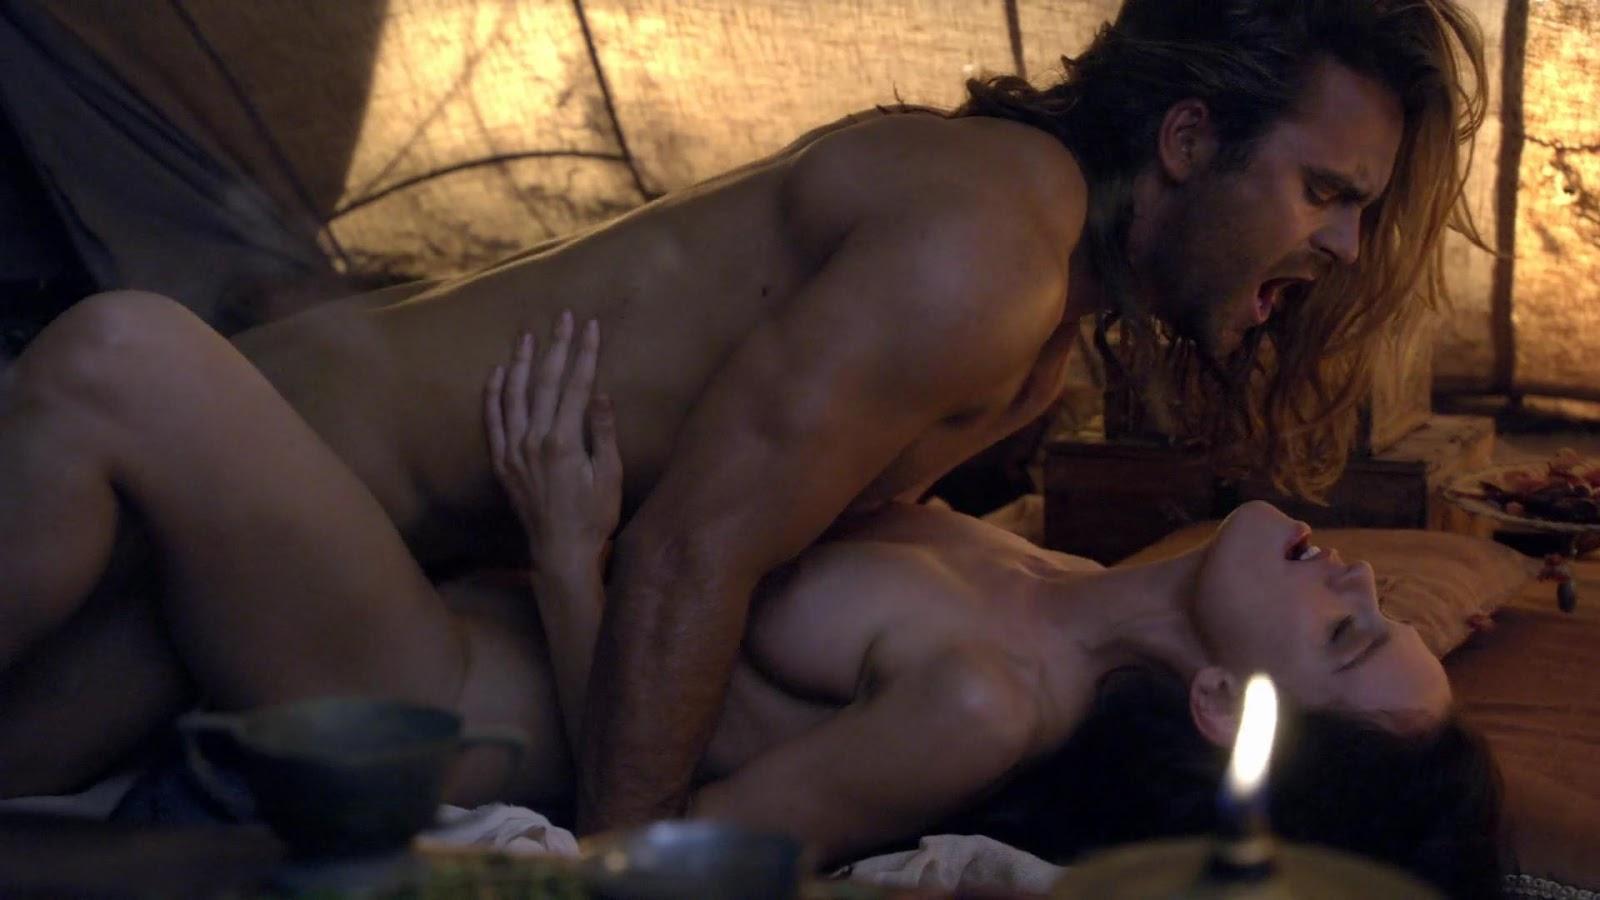 Порно сцен вырезки